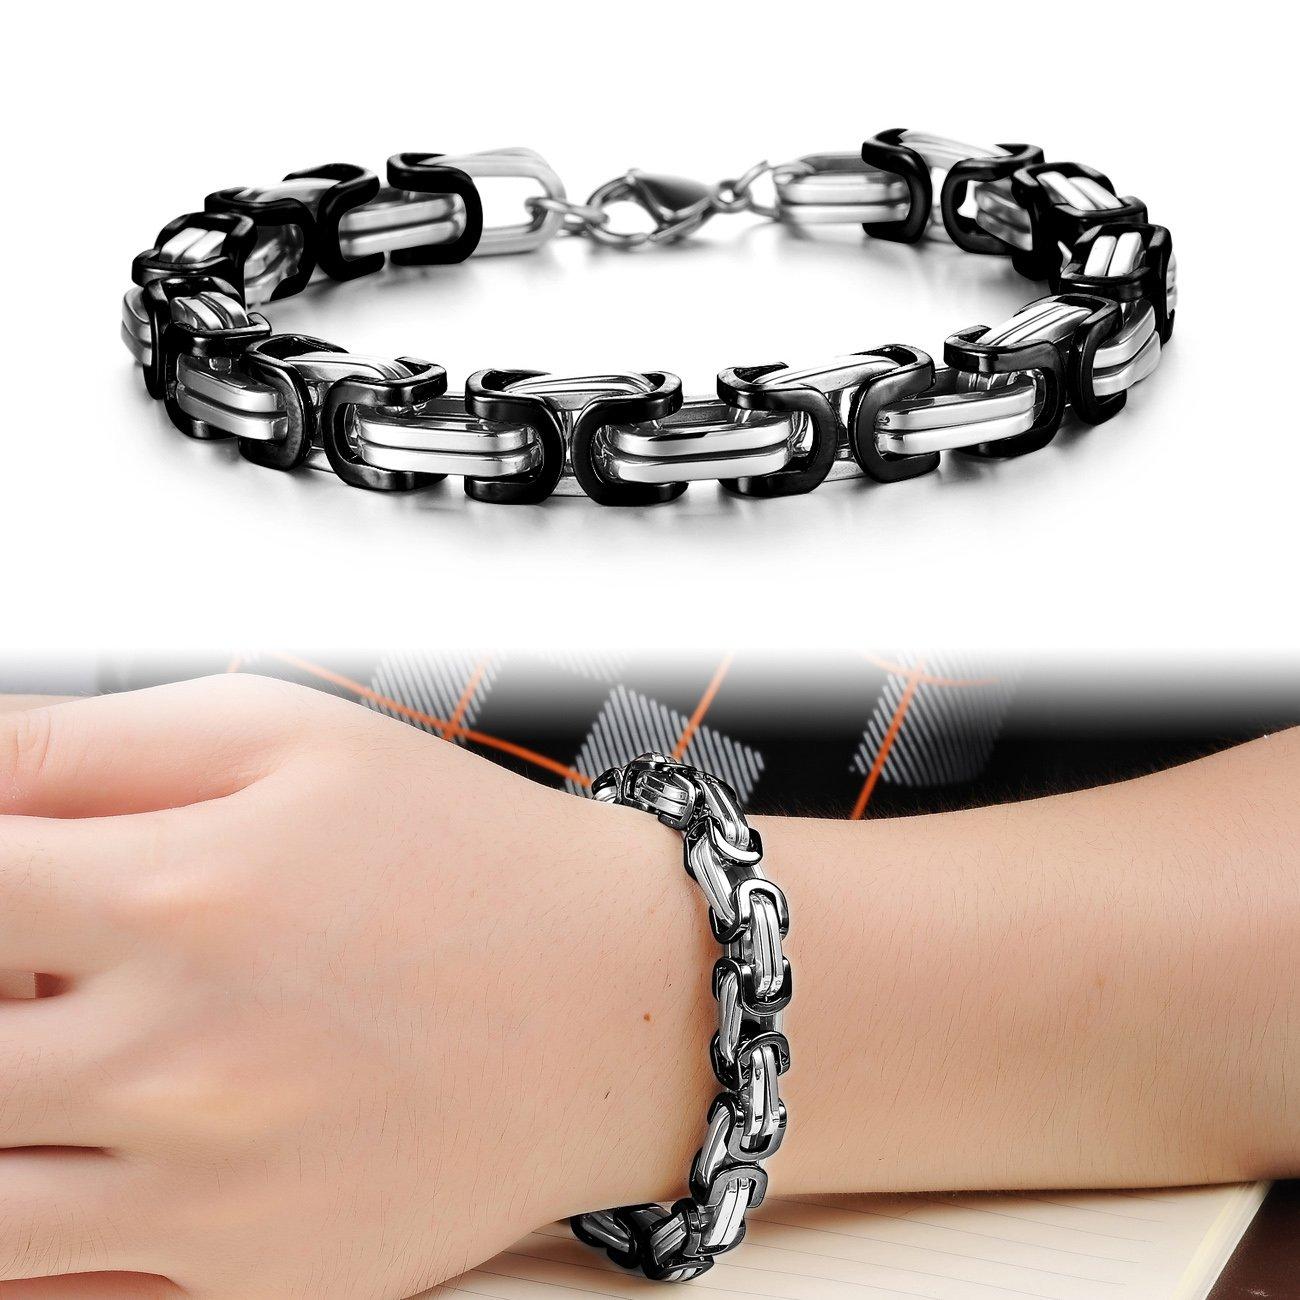 cee4e4a77391f UM Jewelry Fashion Jewelry Mens Stainless Steel Chunky Chain Bracelet 9